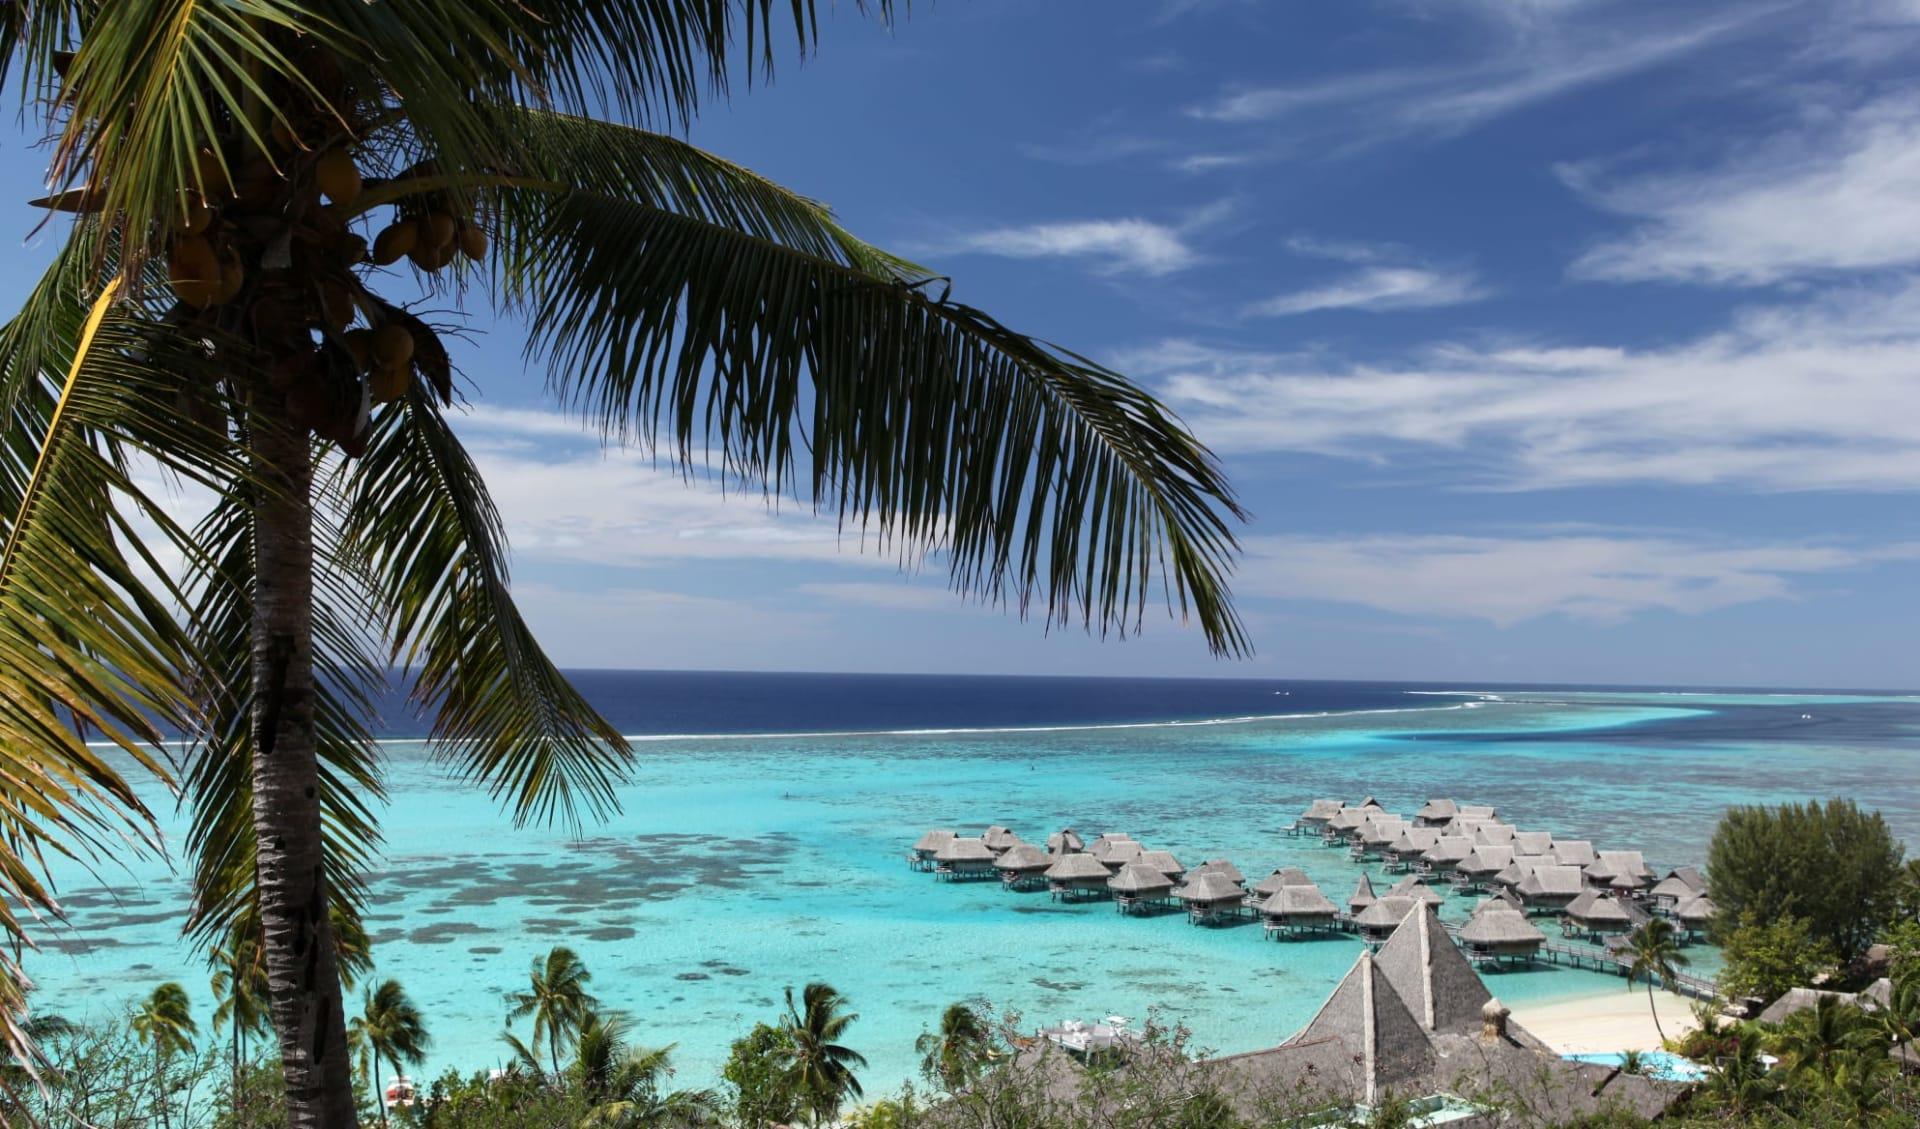 Sofitel Moorea Ia Ora Beach Resort Hotel:  MOZ Sofitel Moorea Aerial View 3